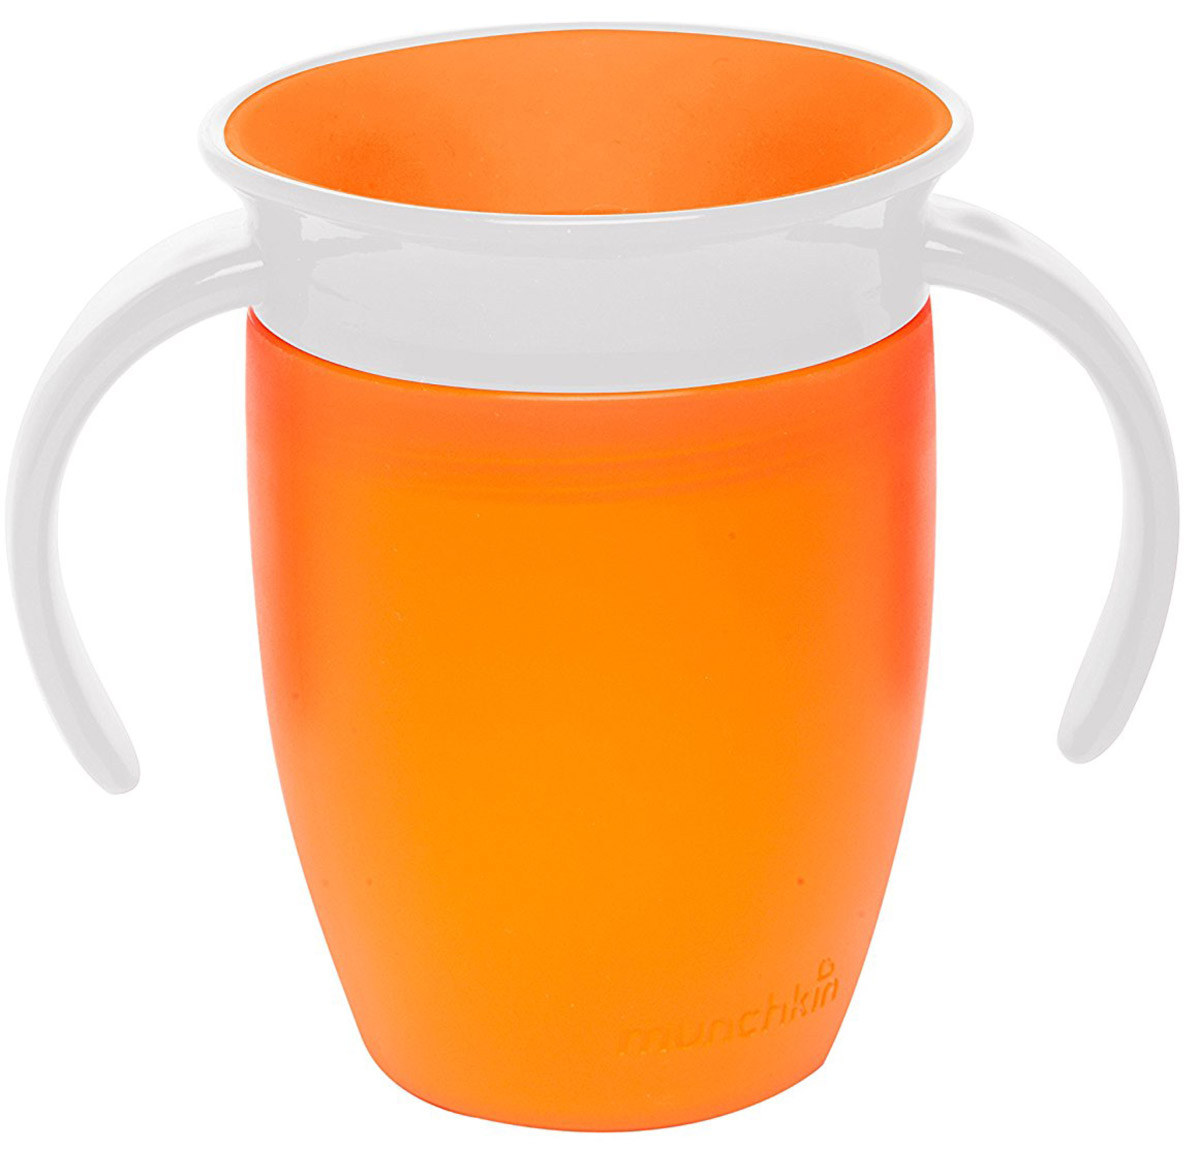 Munchkin Поильник-непроливайка Miracle 360° цвет оранжевый от 6 месяцев 207 мл -  Поильники